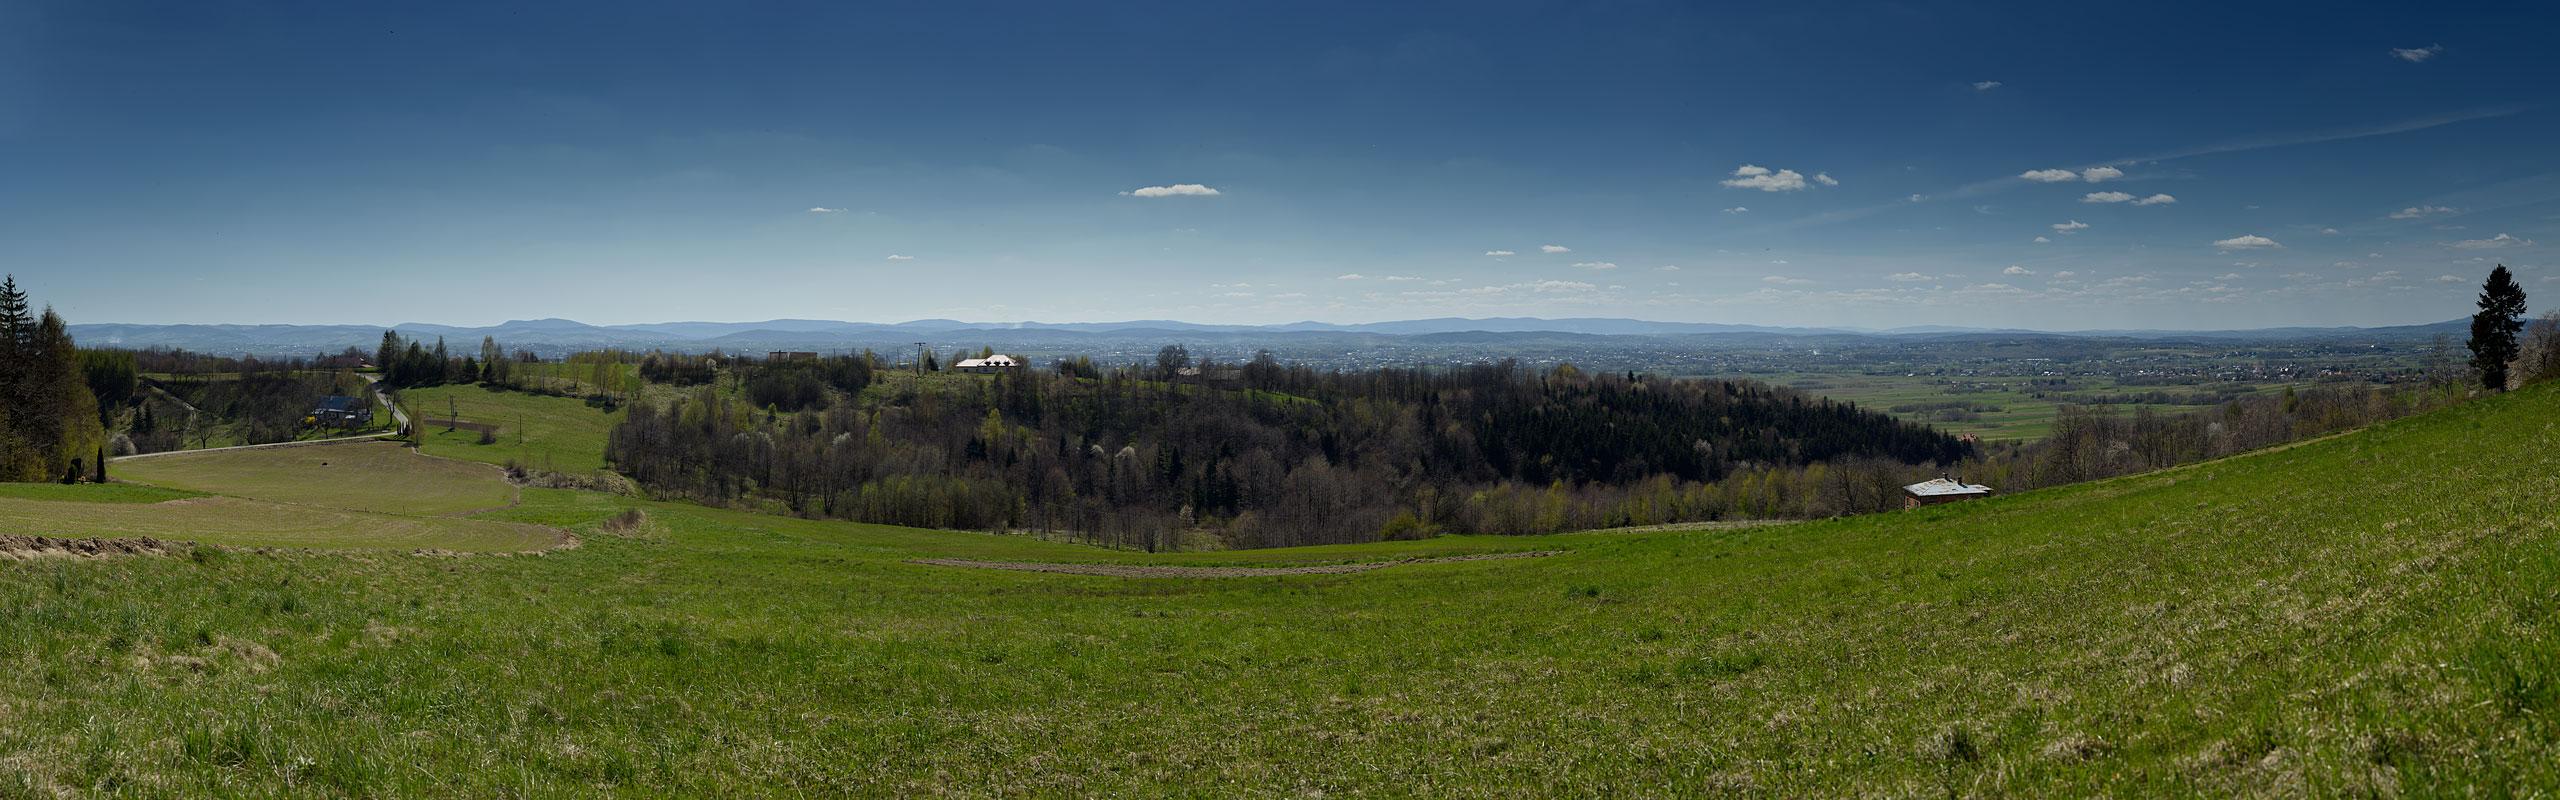 Krosno Valley high resolution panorama link